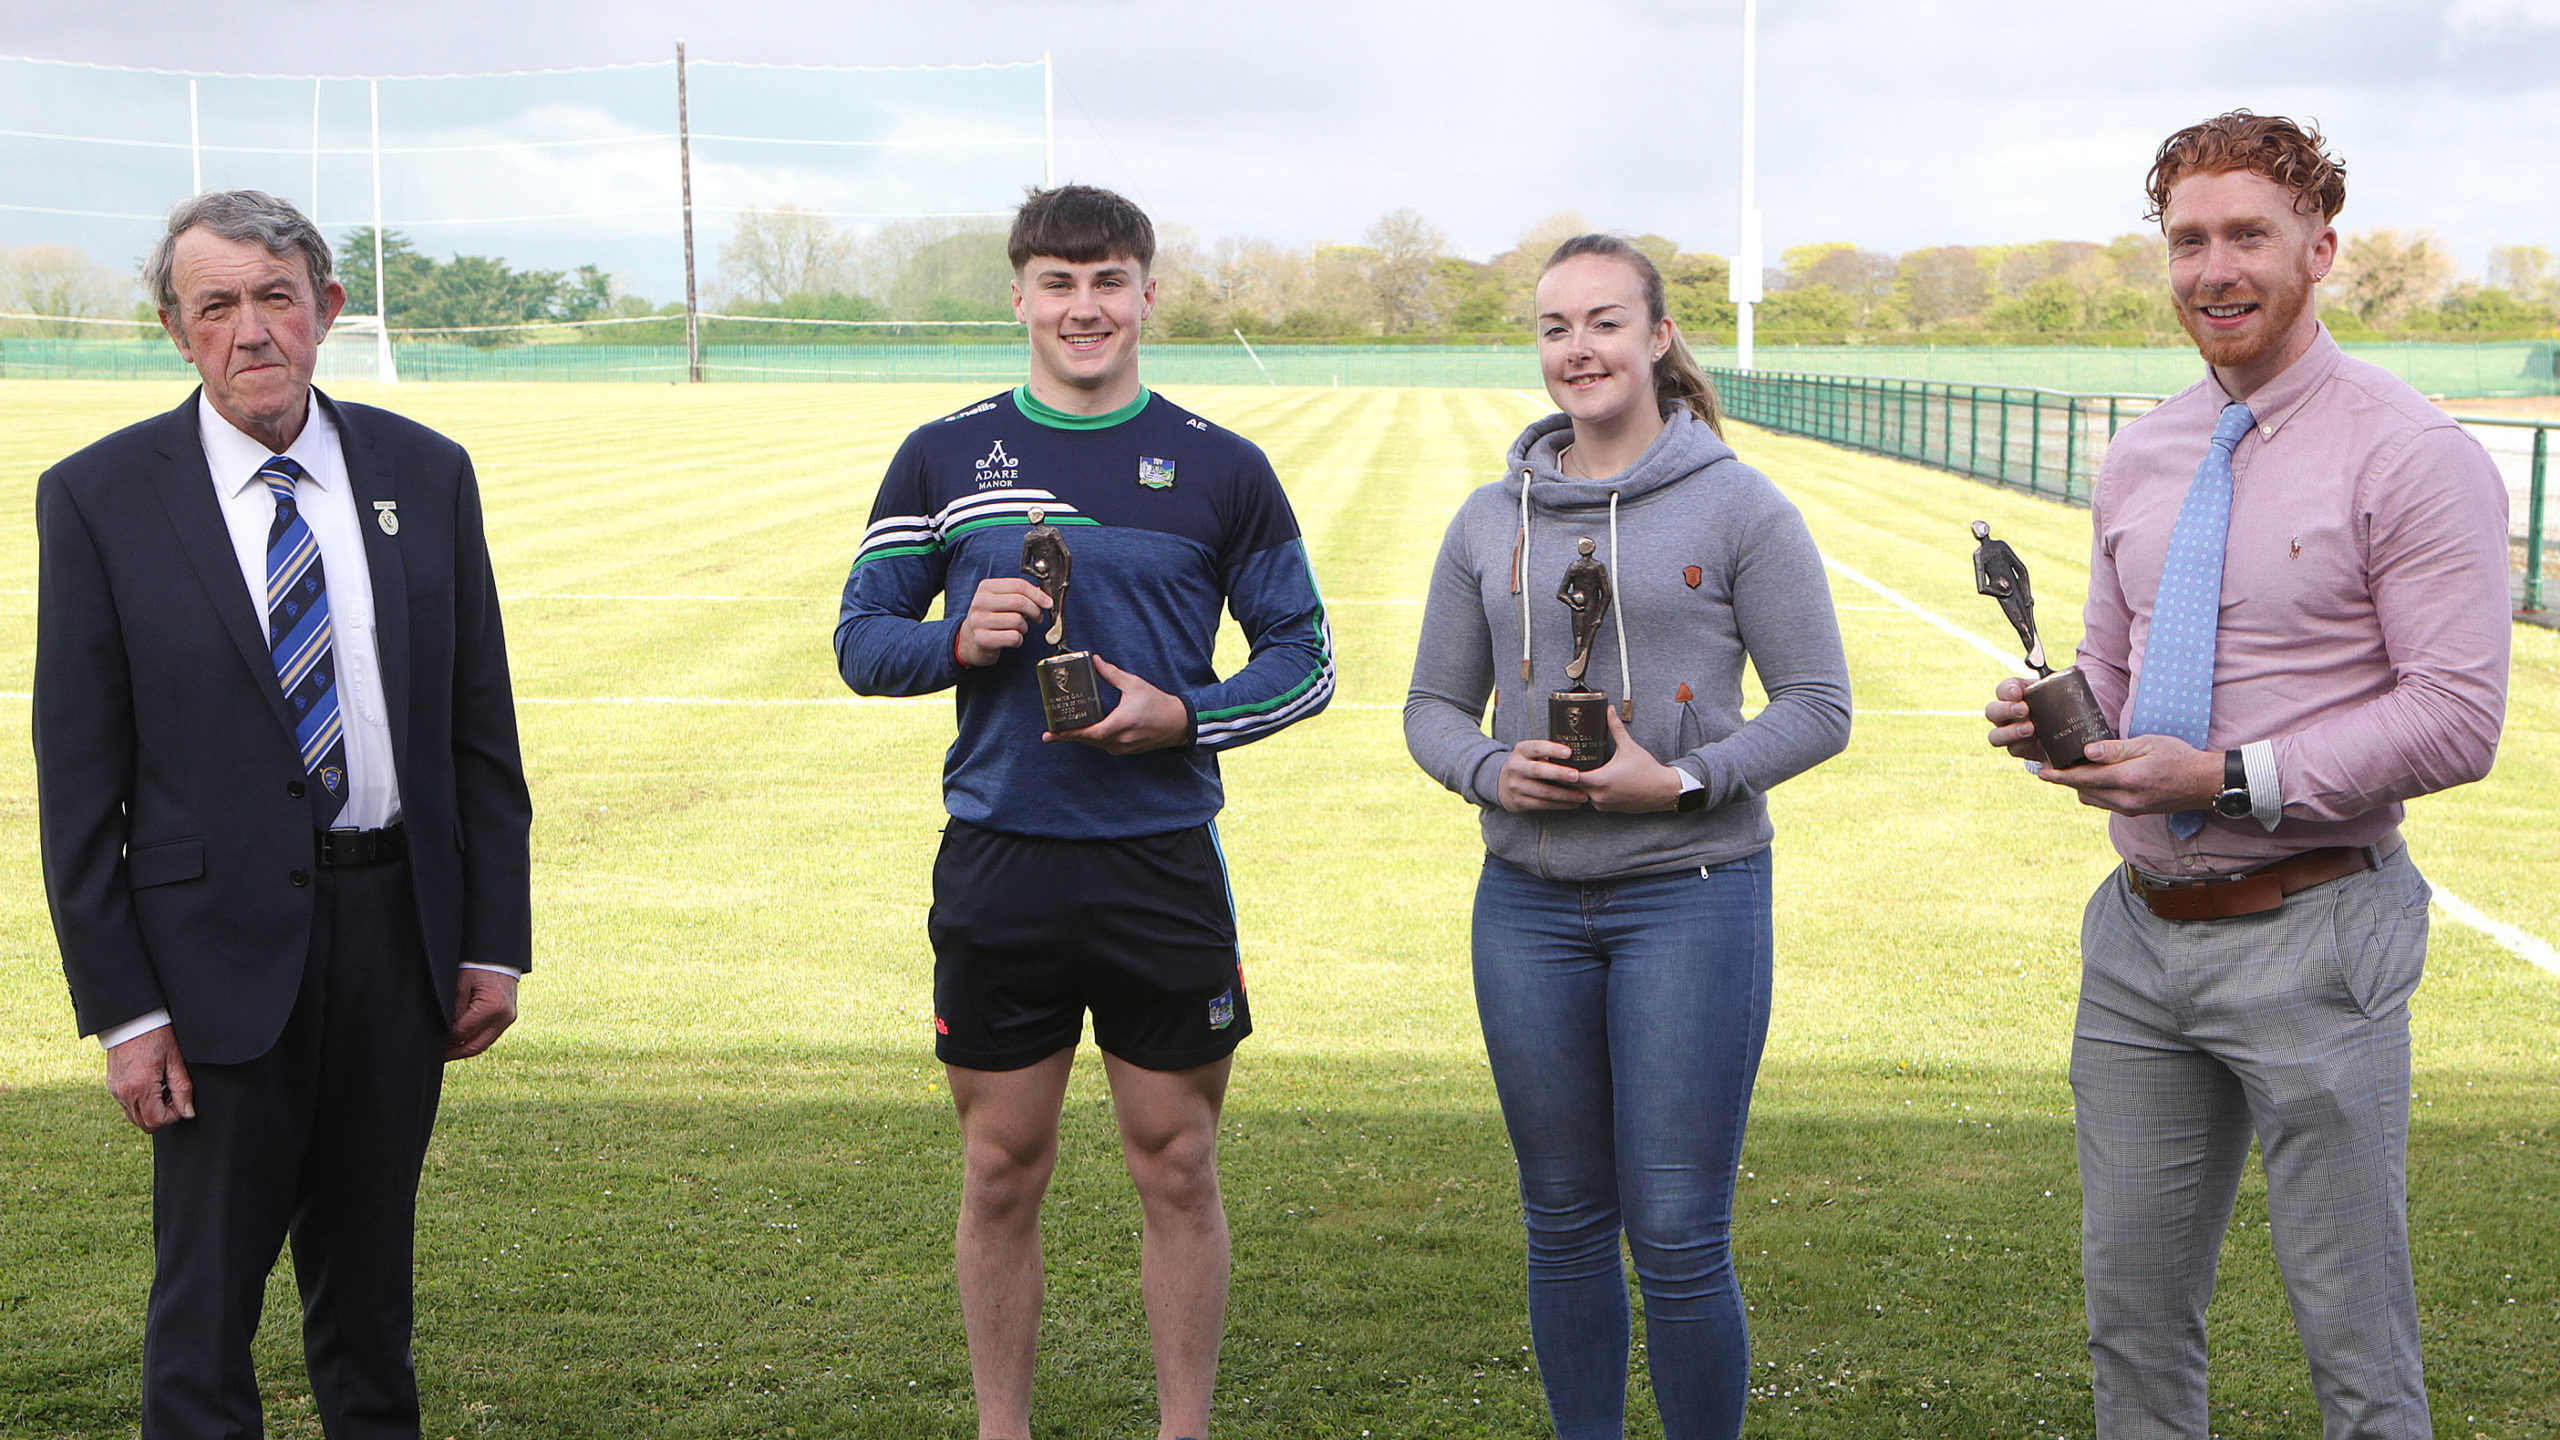 2020 Munster GAA Award winners announced